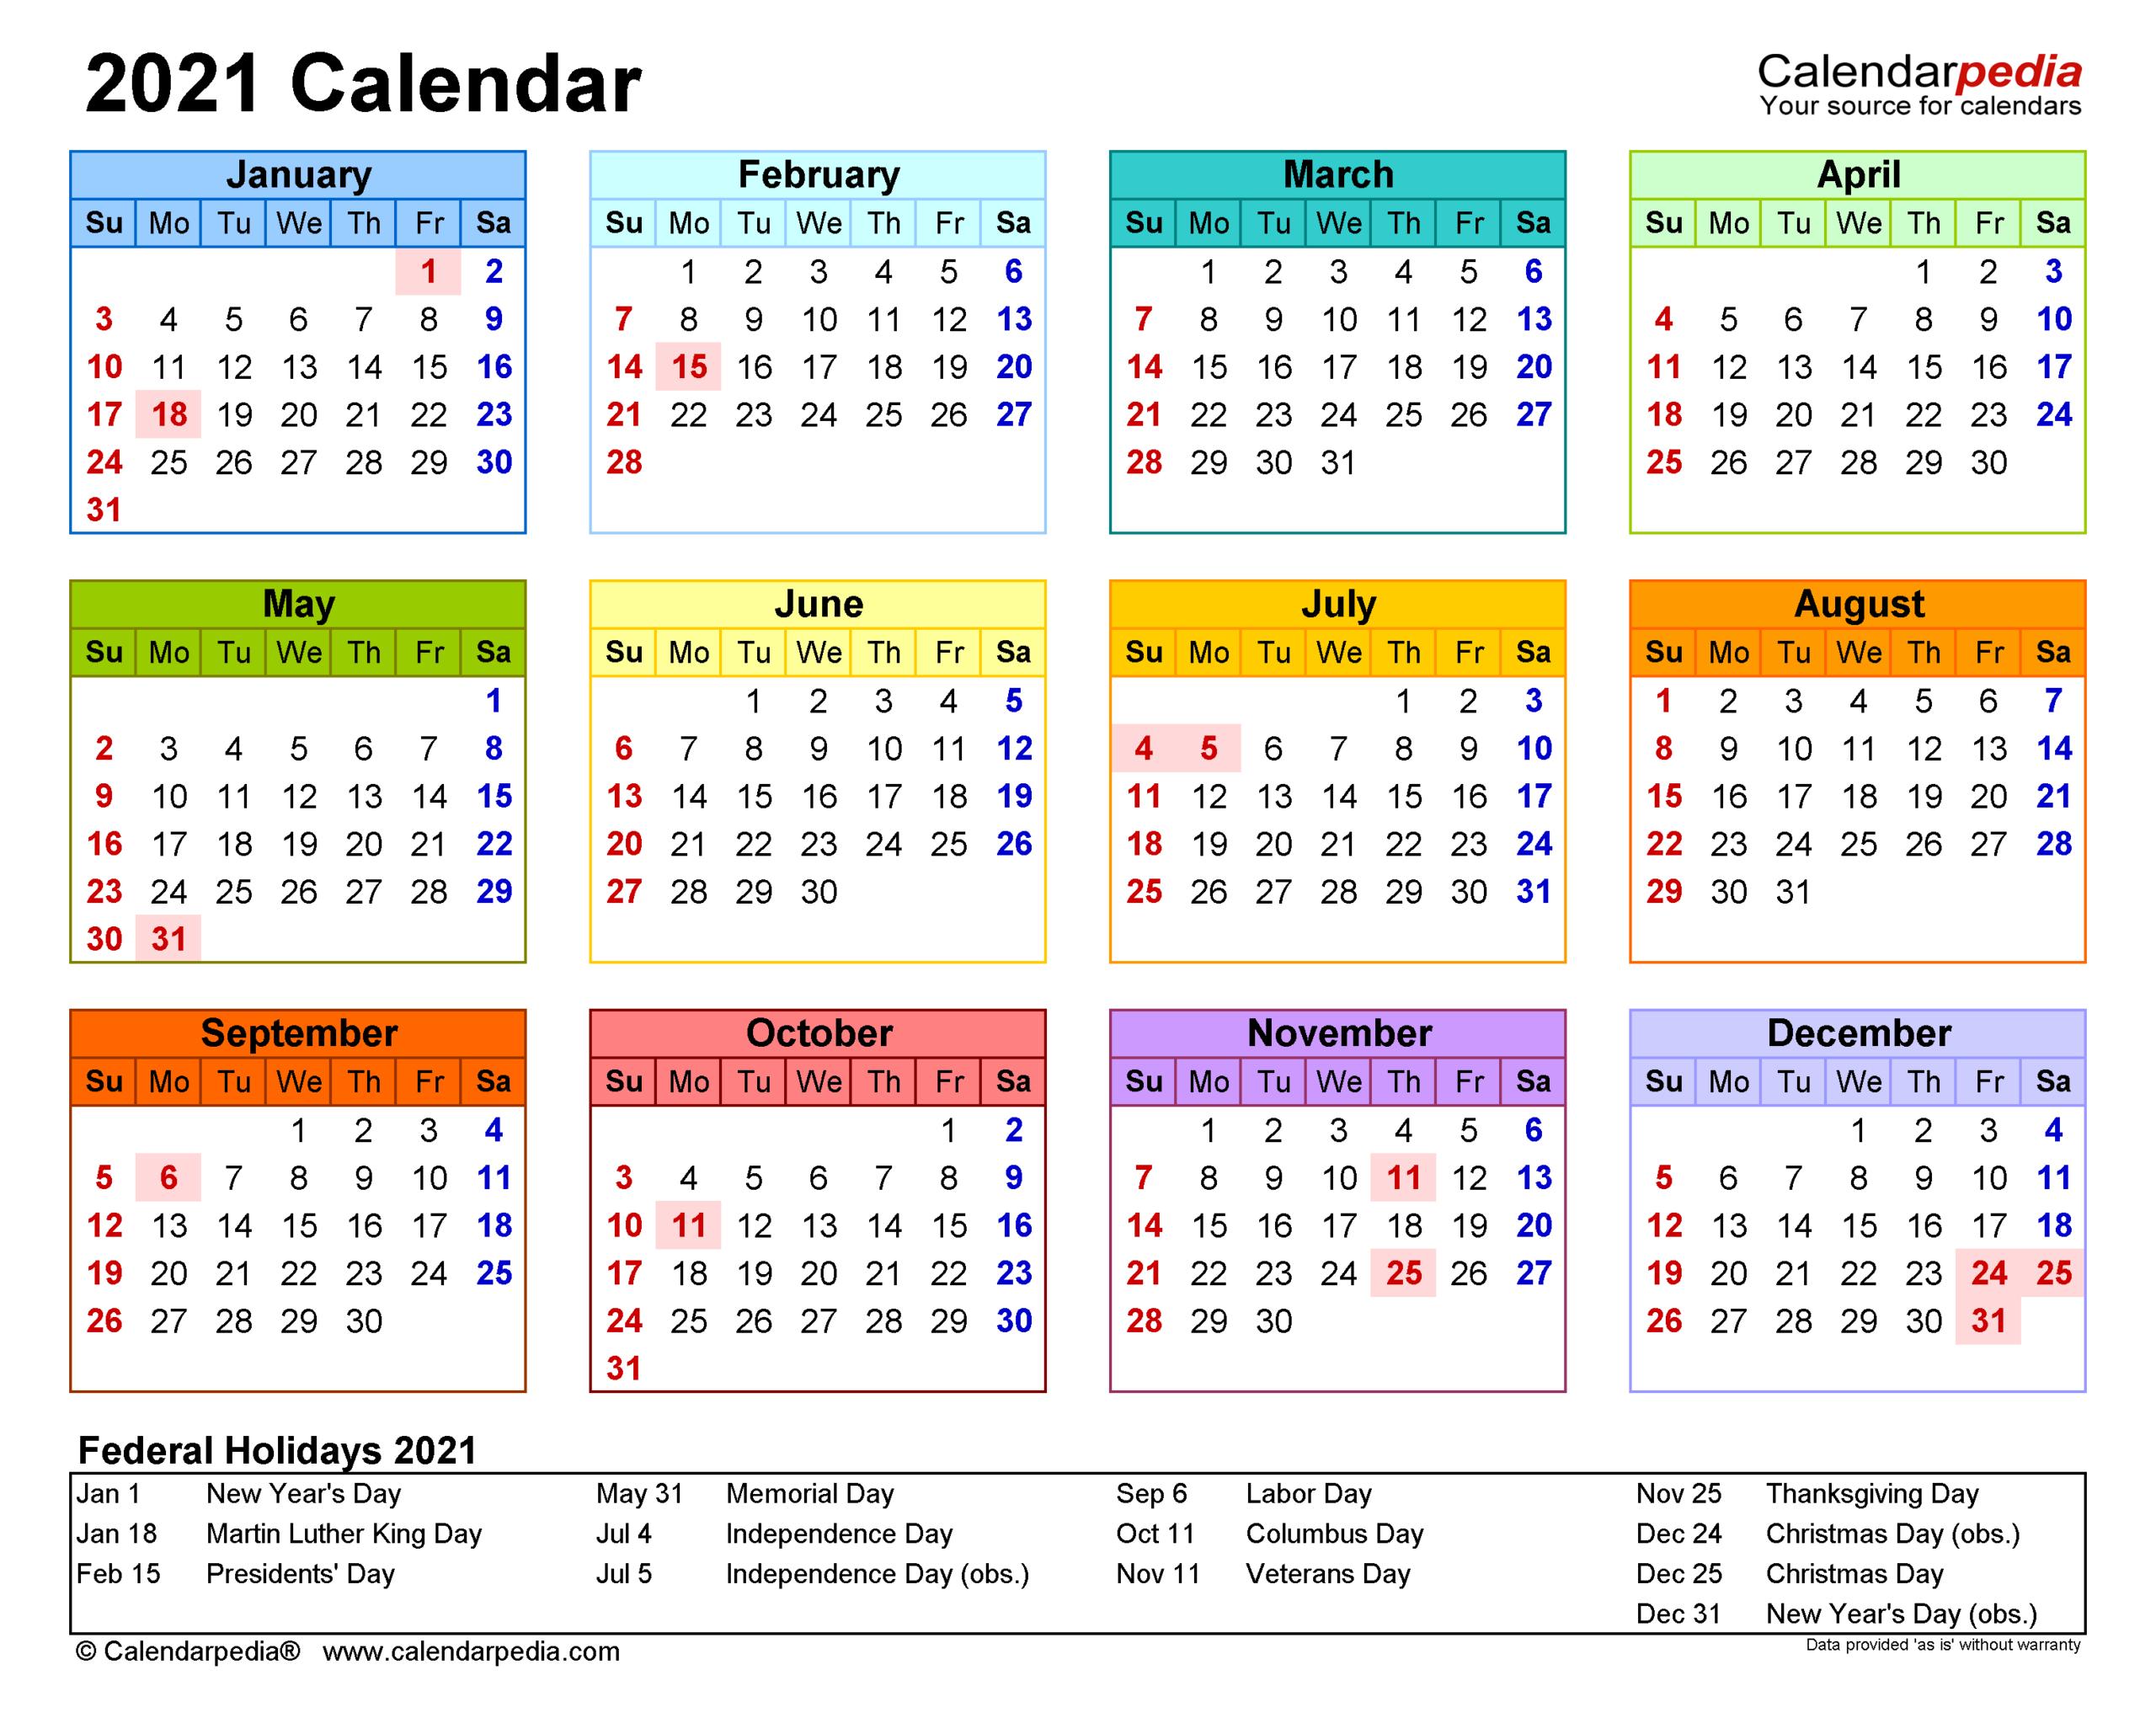 2021 Calendar - Free Printable Excel Templates - Calendarpedia